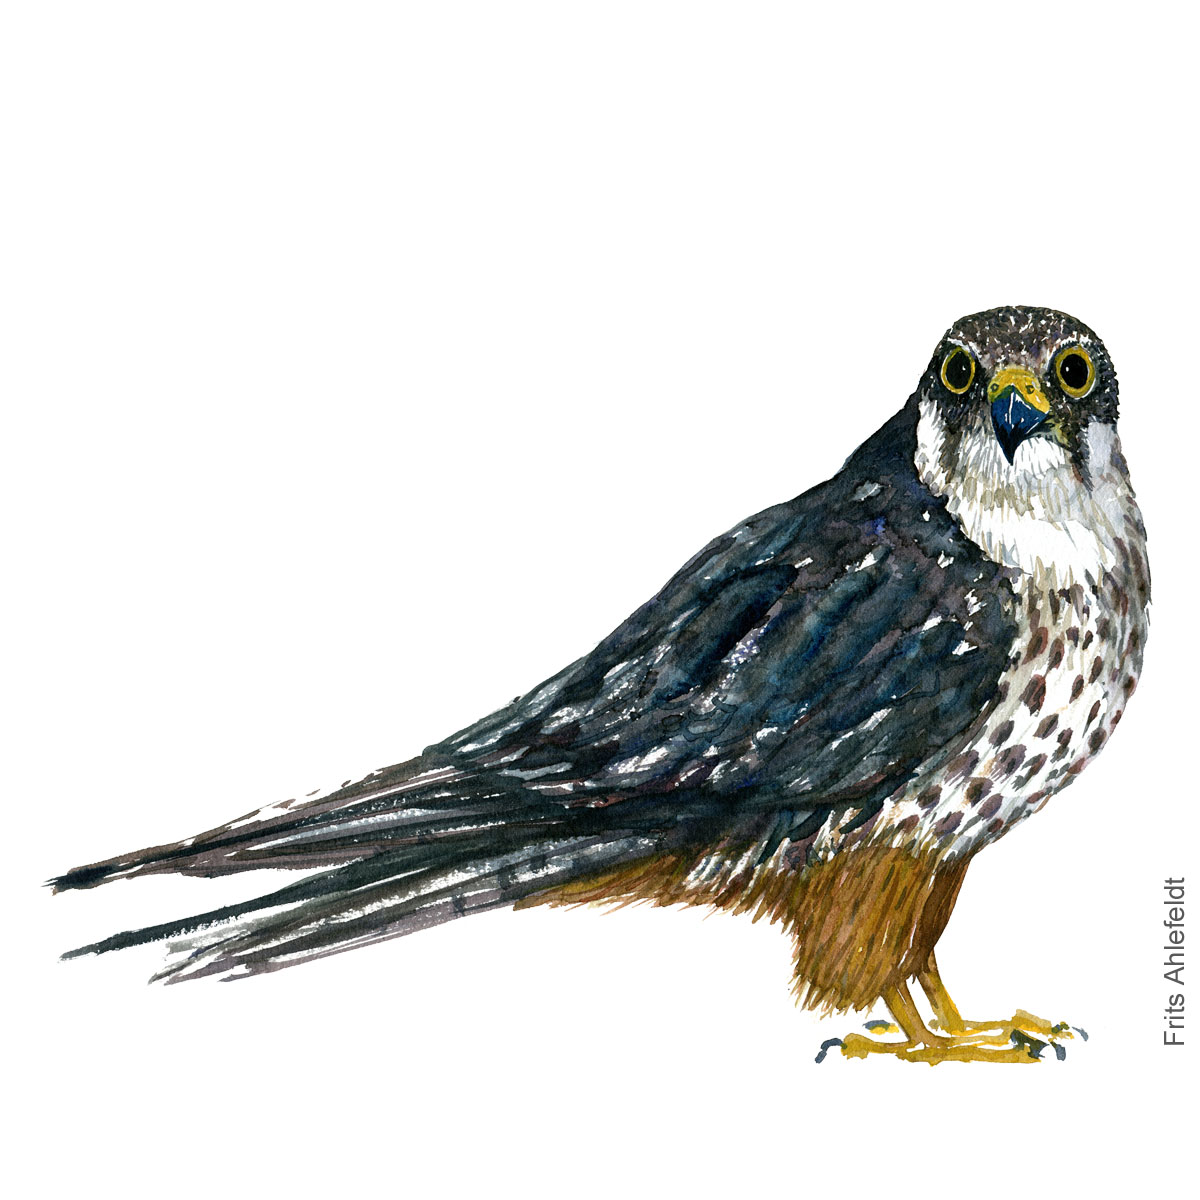 Laerkefalk Hobby - Bird painting in watercolor by Frits Ahlefeldt - Fugle akvarel